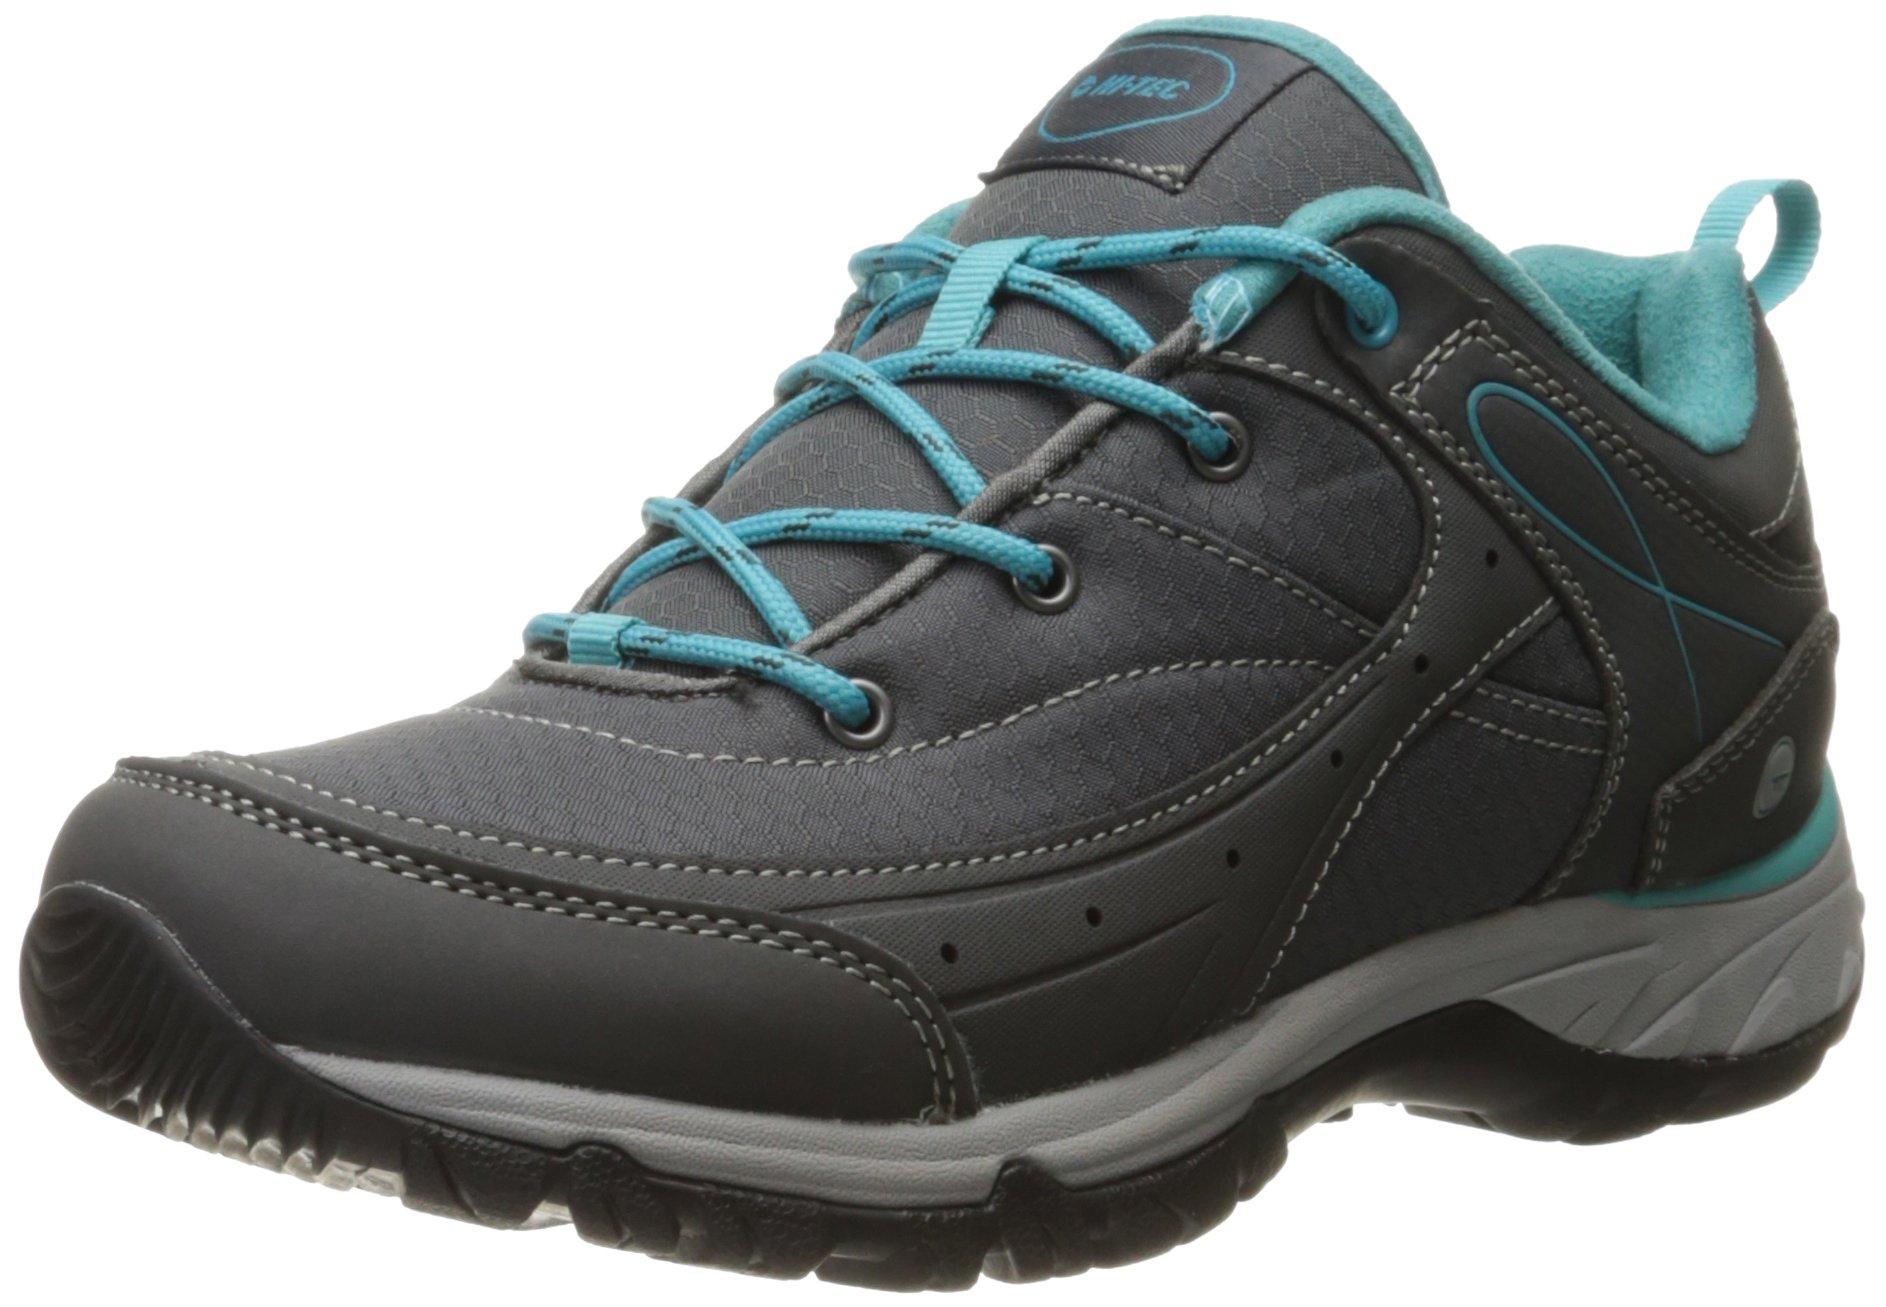 Hi-Tec Women's Equilibrio Bijou Low I Hiking Shoe, Charcoal/Tile Blue, 7 D US